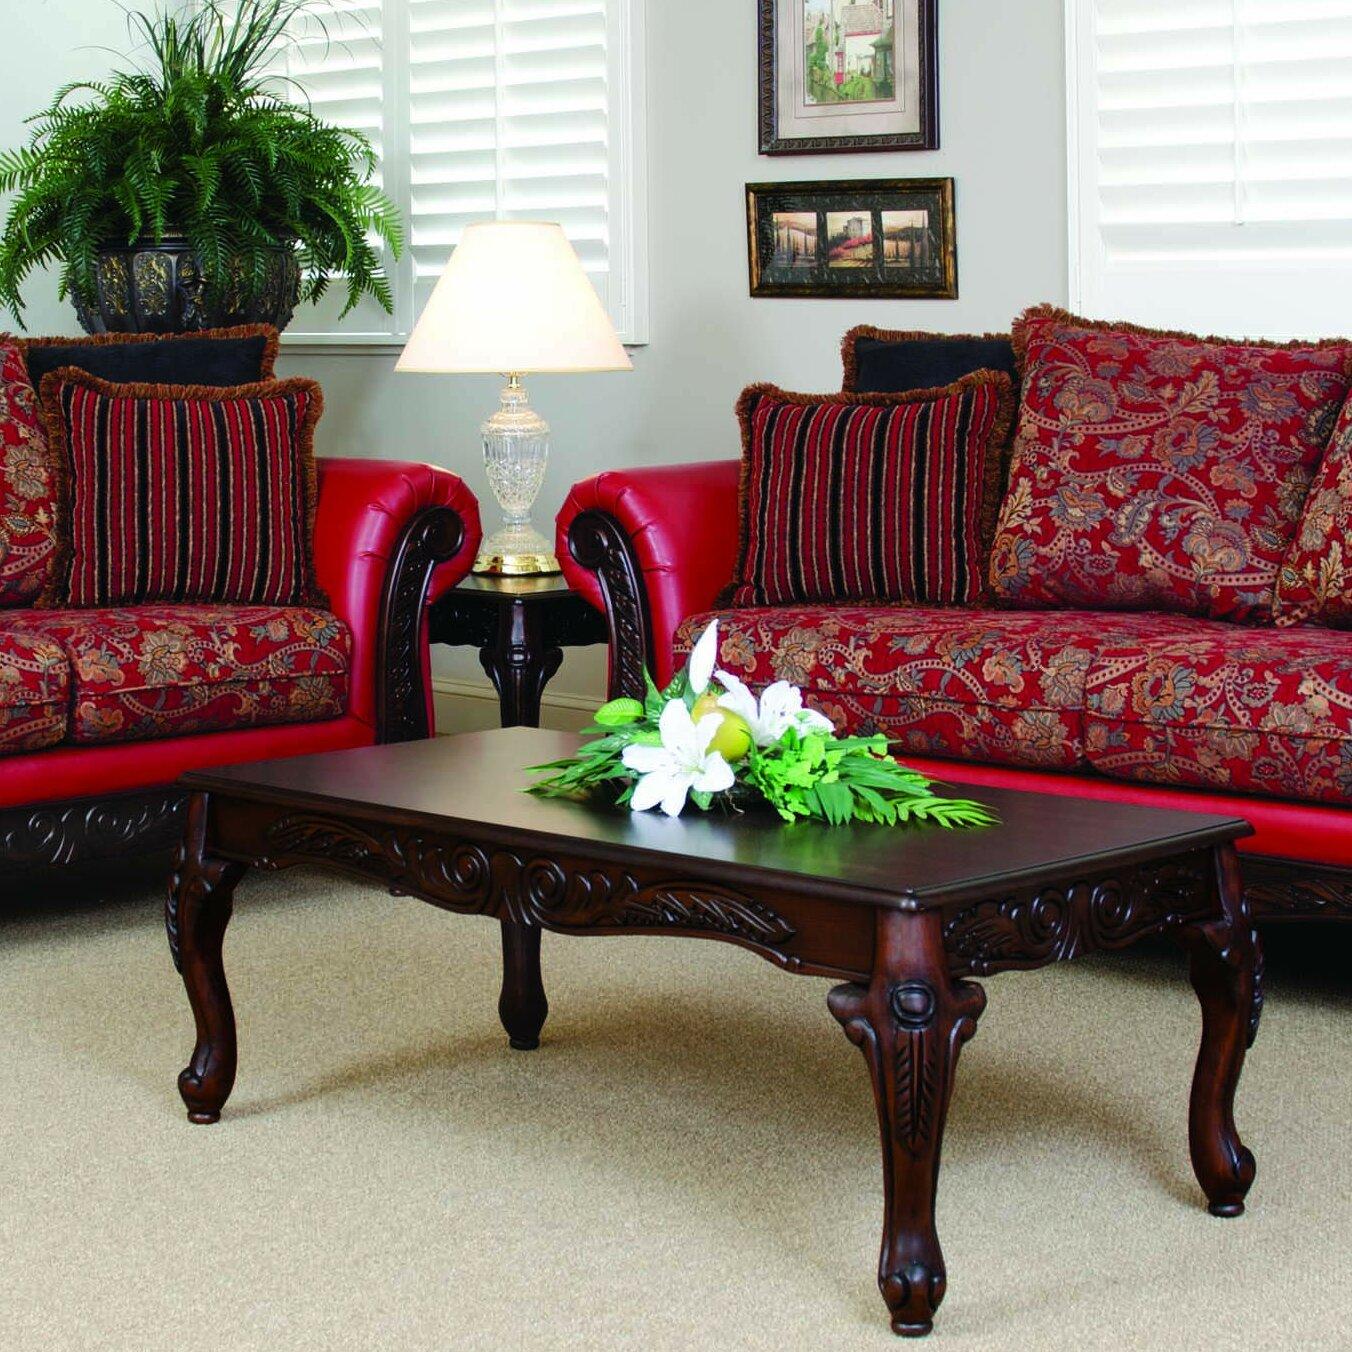 Astoria Grand Serta Upholstery Belmond Coffee Table Set